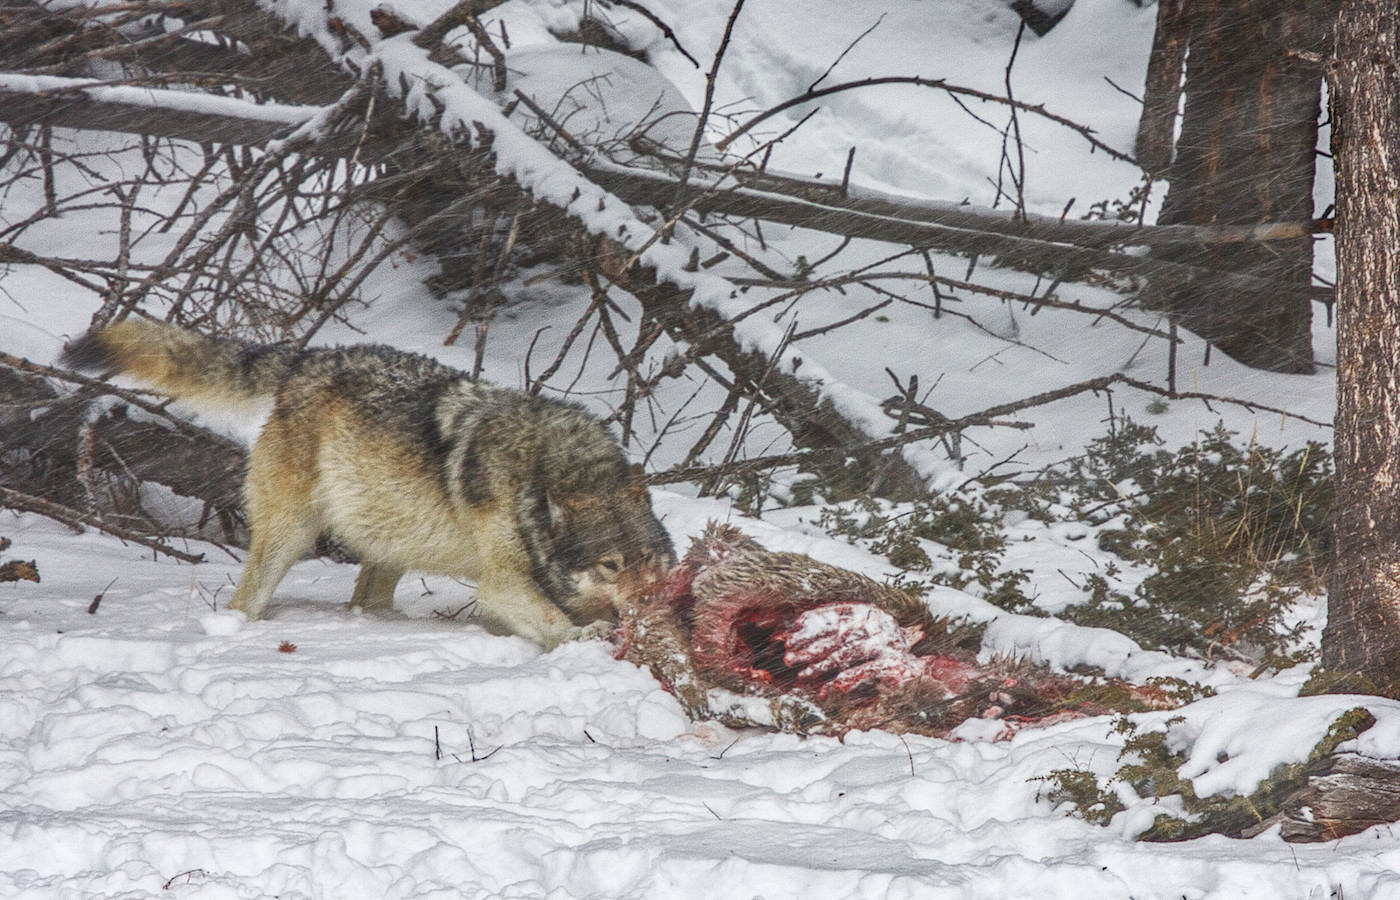 18 WOLF FEEDING IN BLIZZARD by Carole Lewis